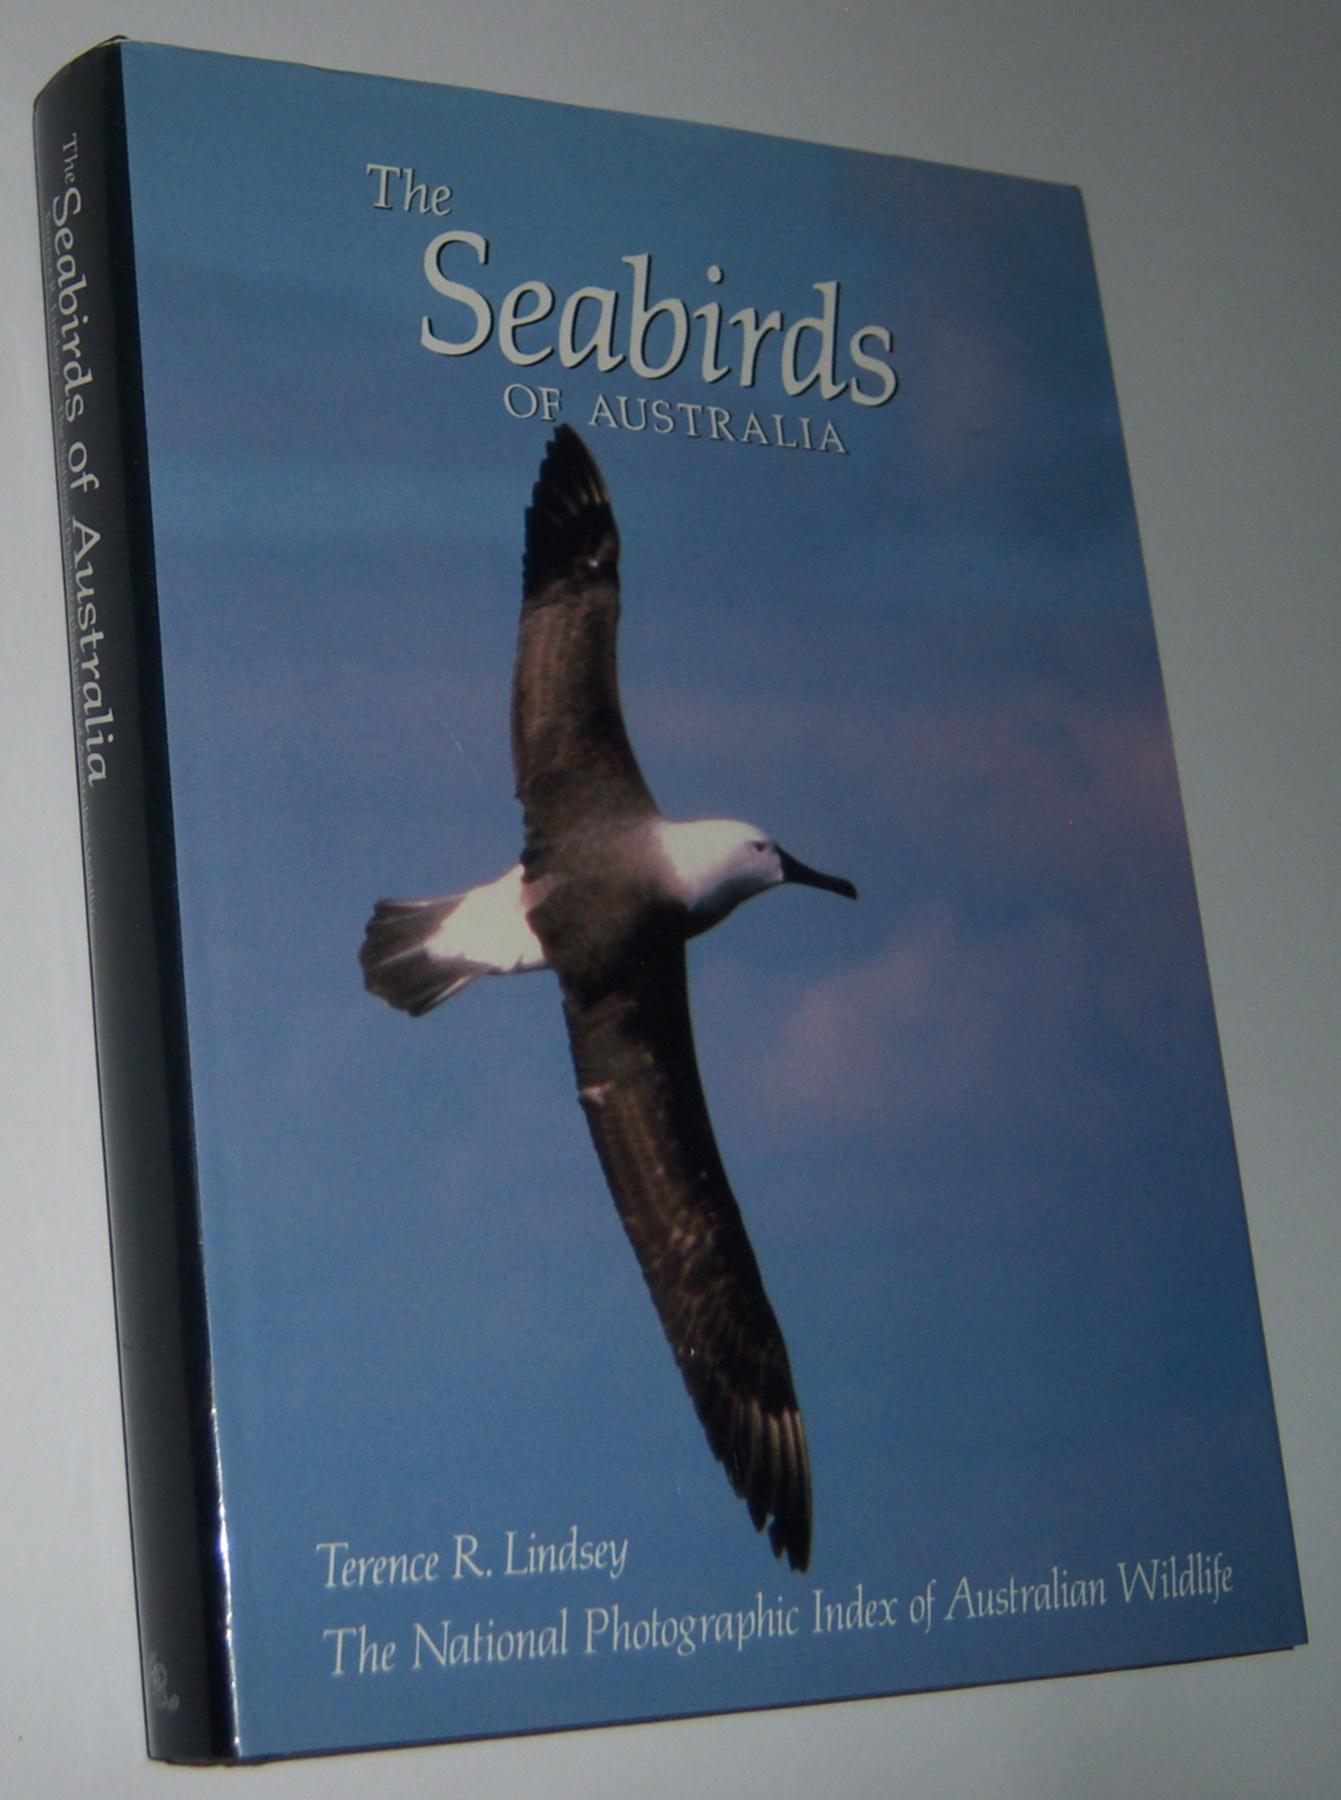 THE SEABIRDS OF AUSTRALIA